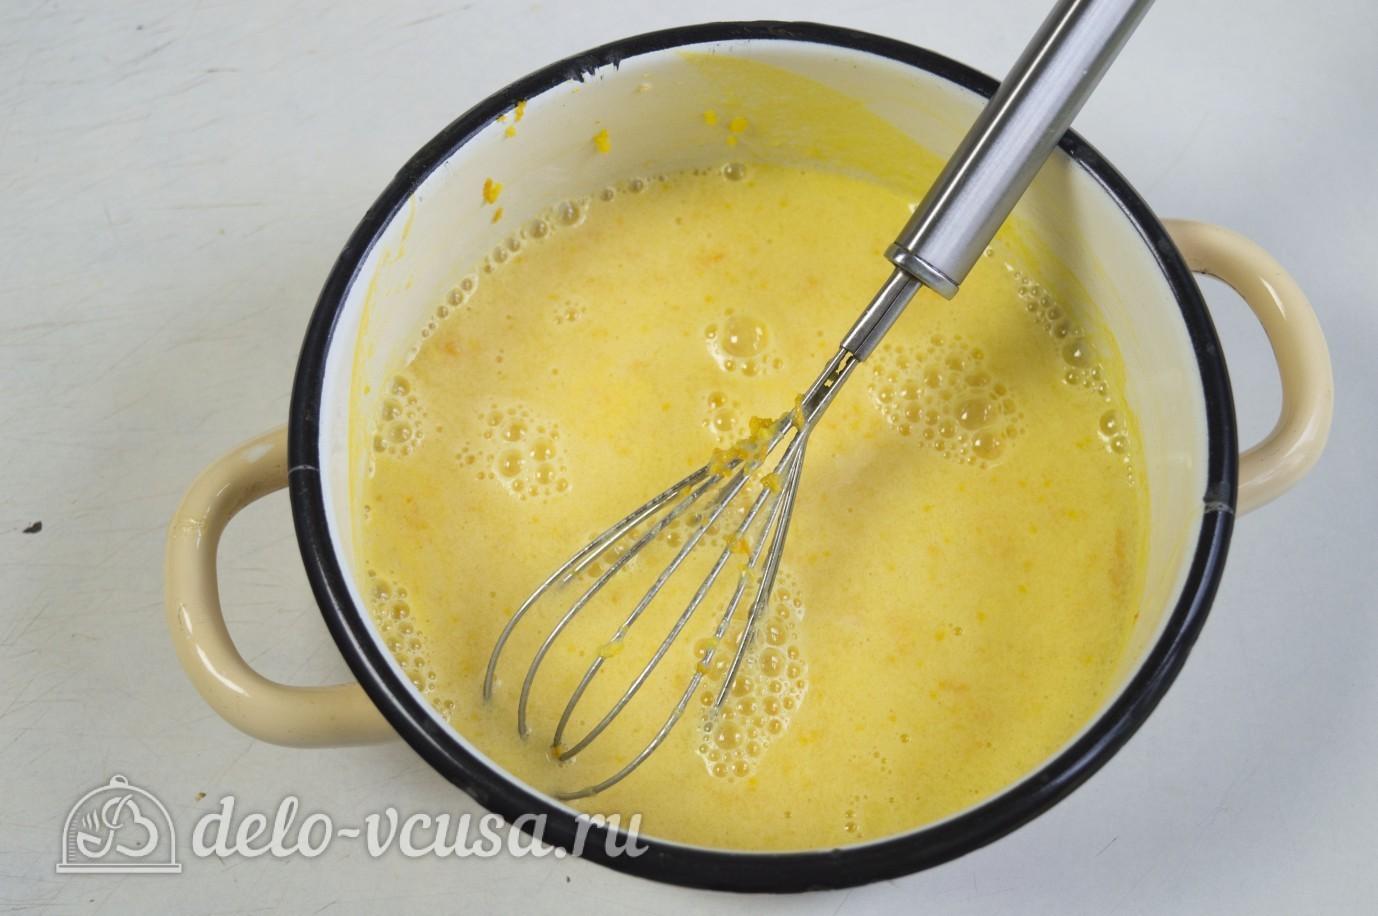 Сироп для пропитки бисквита пошагово